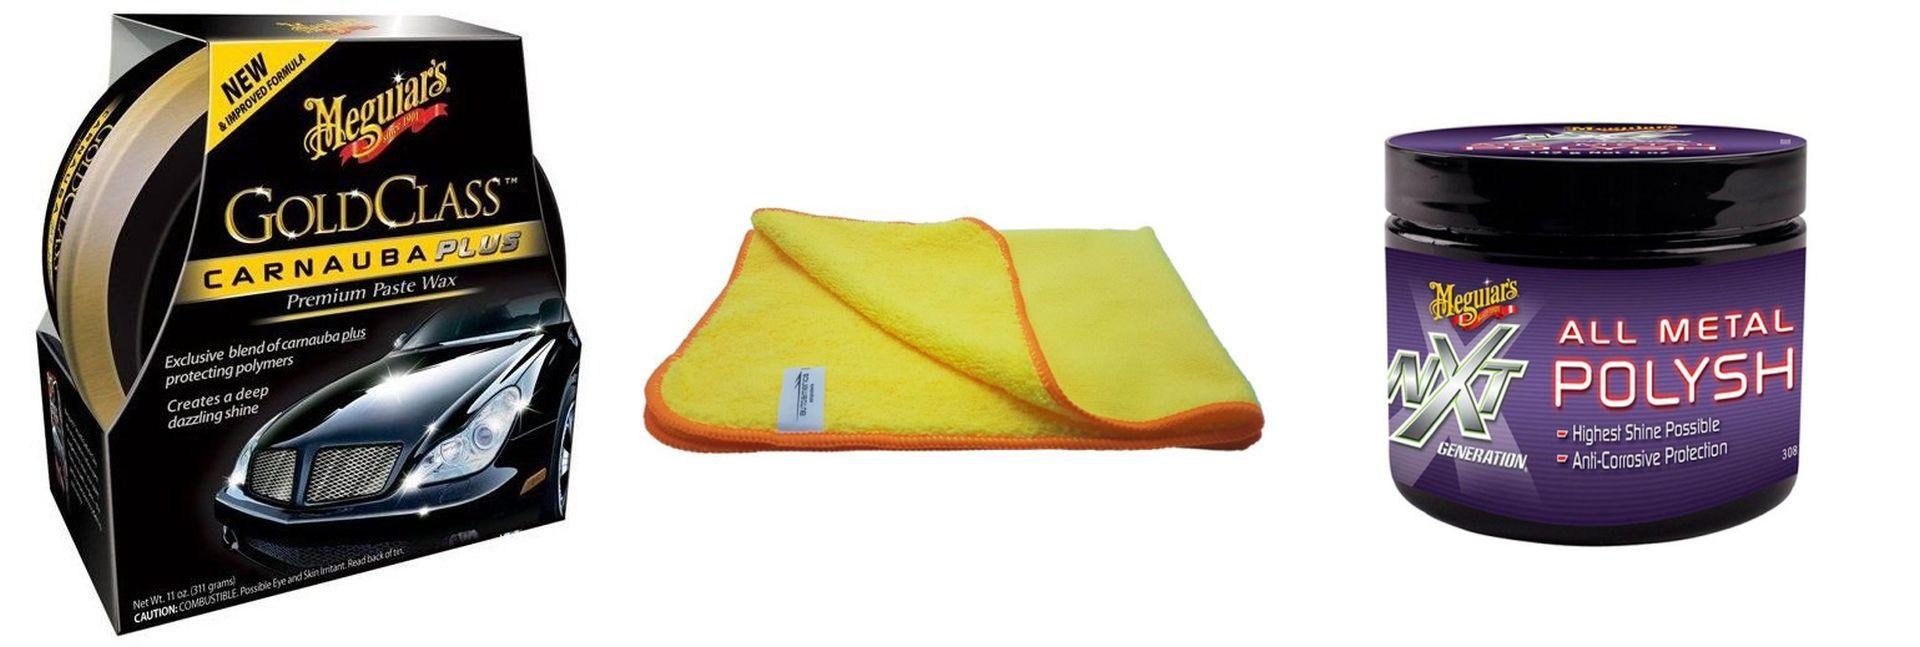 Kit Cera Gold Class+ Polidor De Metais Nxt+ Flanela 40x60